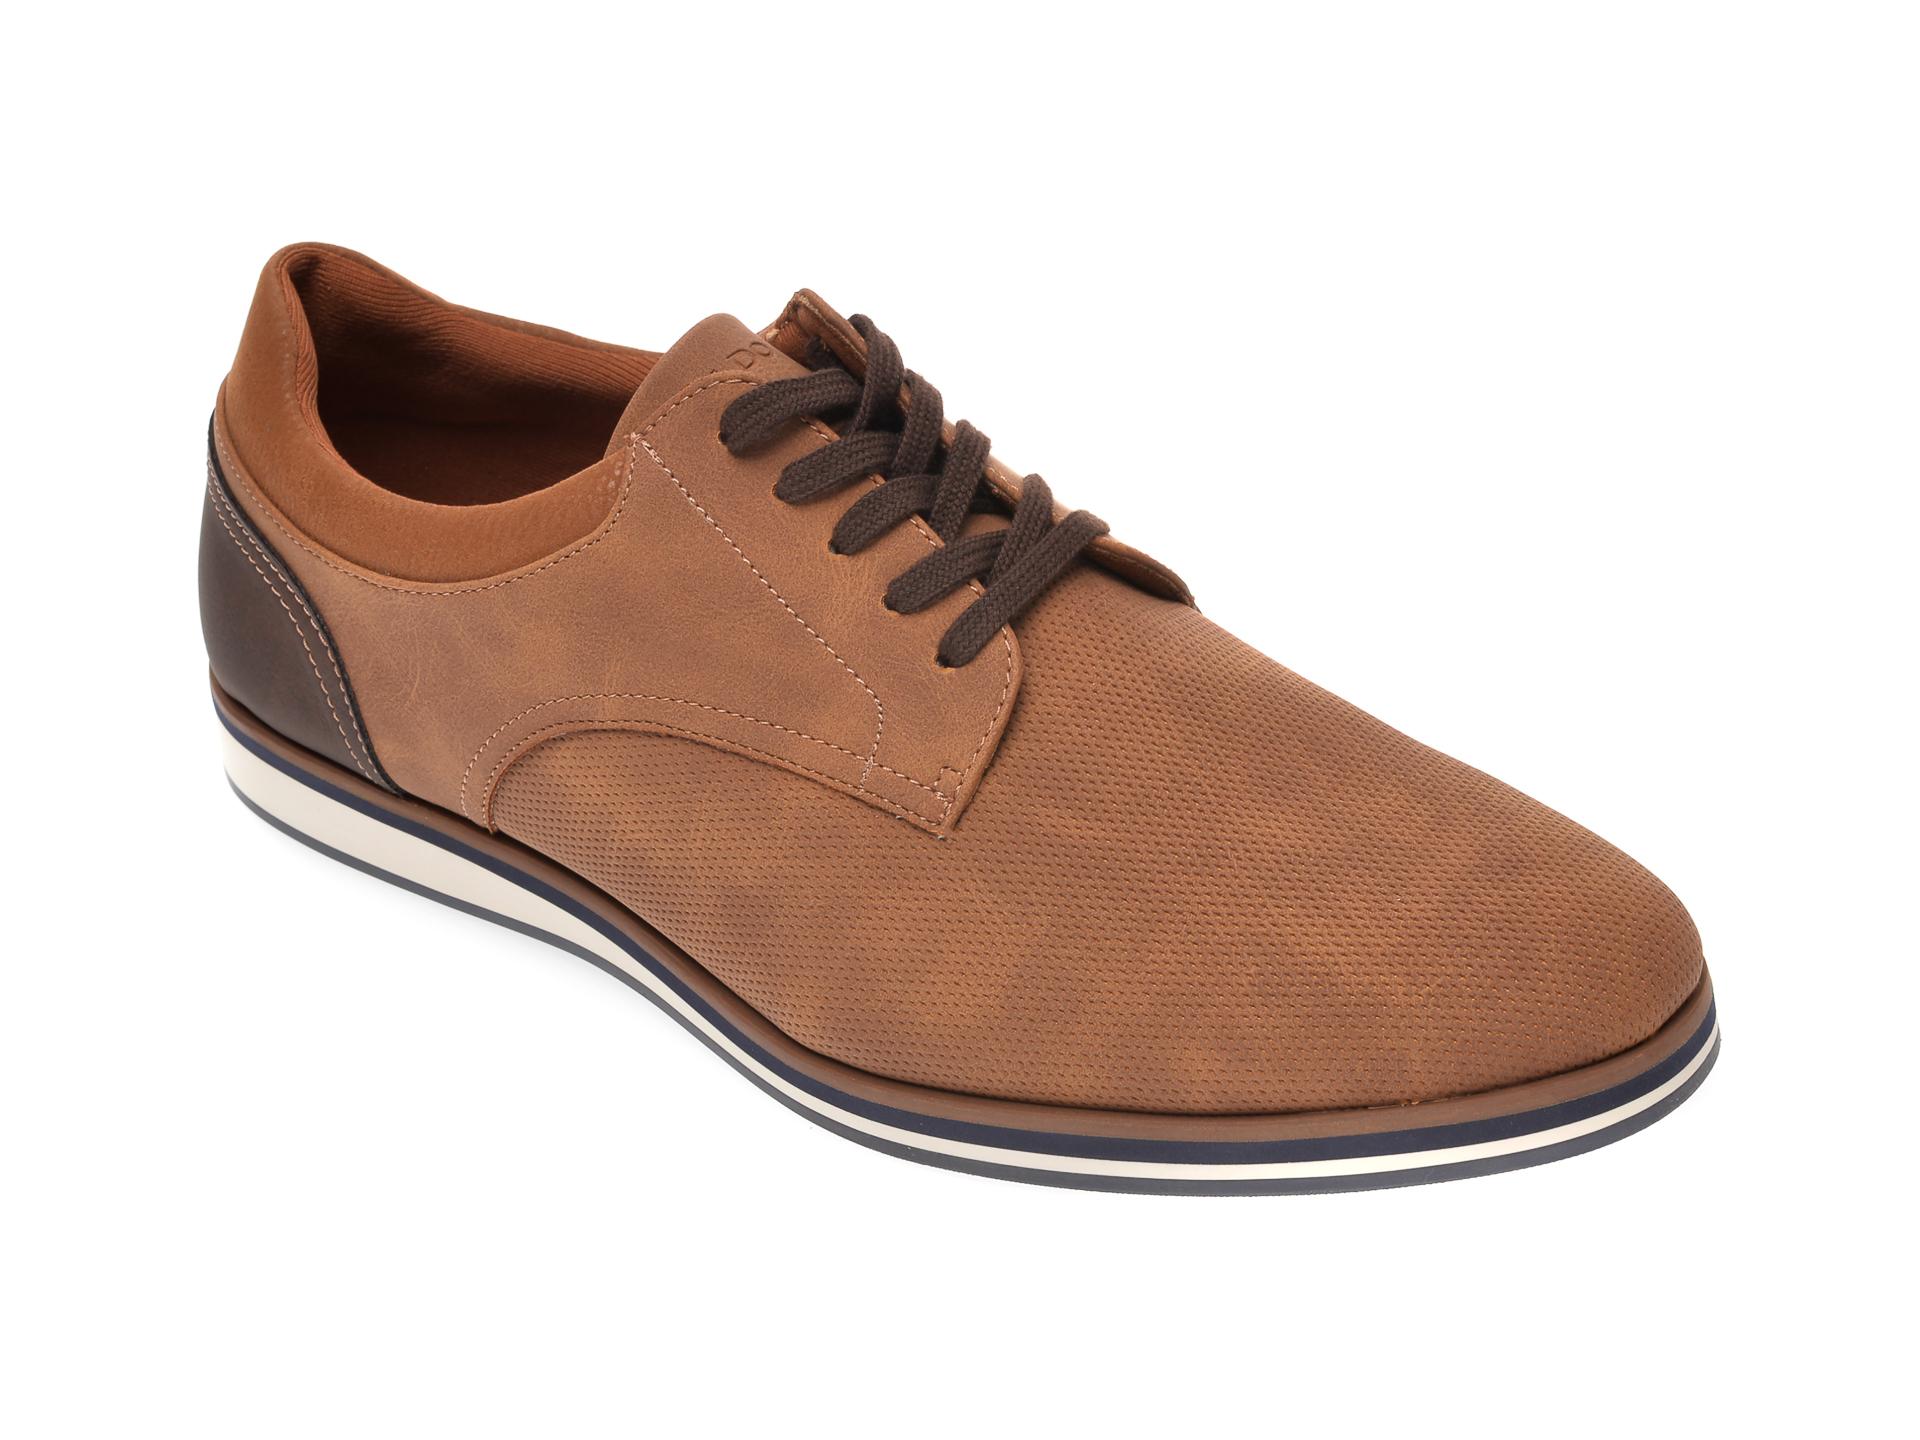 Pantofi Aldo Maro, Cycia230, Din Piele Ecologica